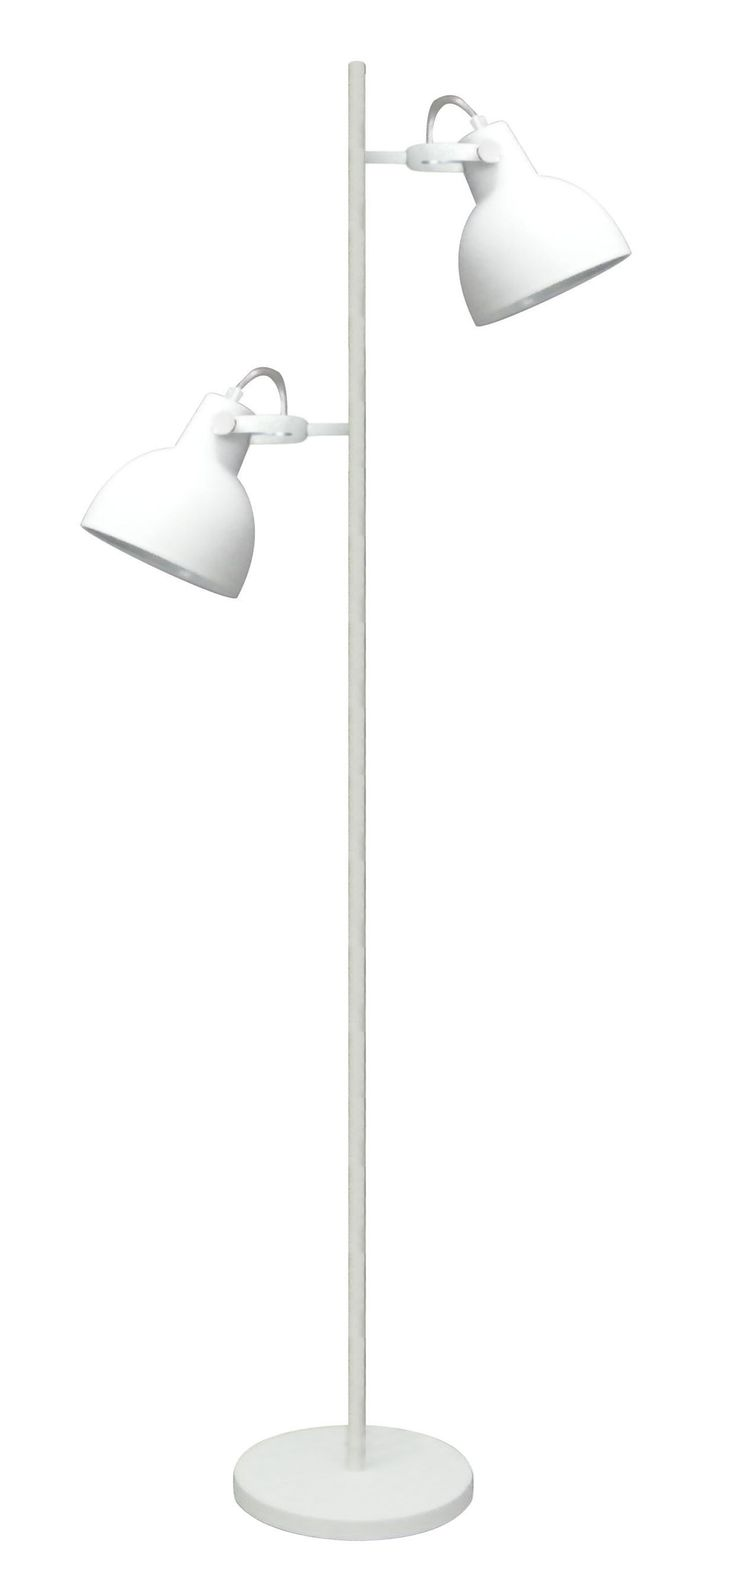 Staande lamp wit